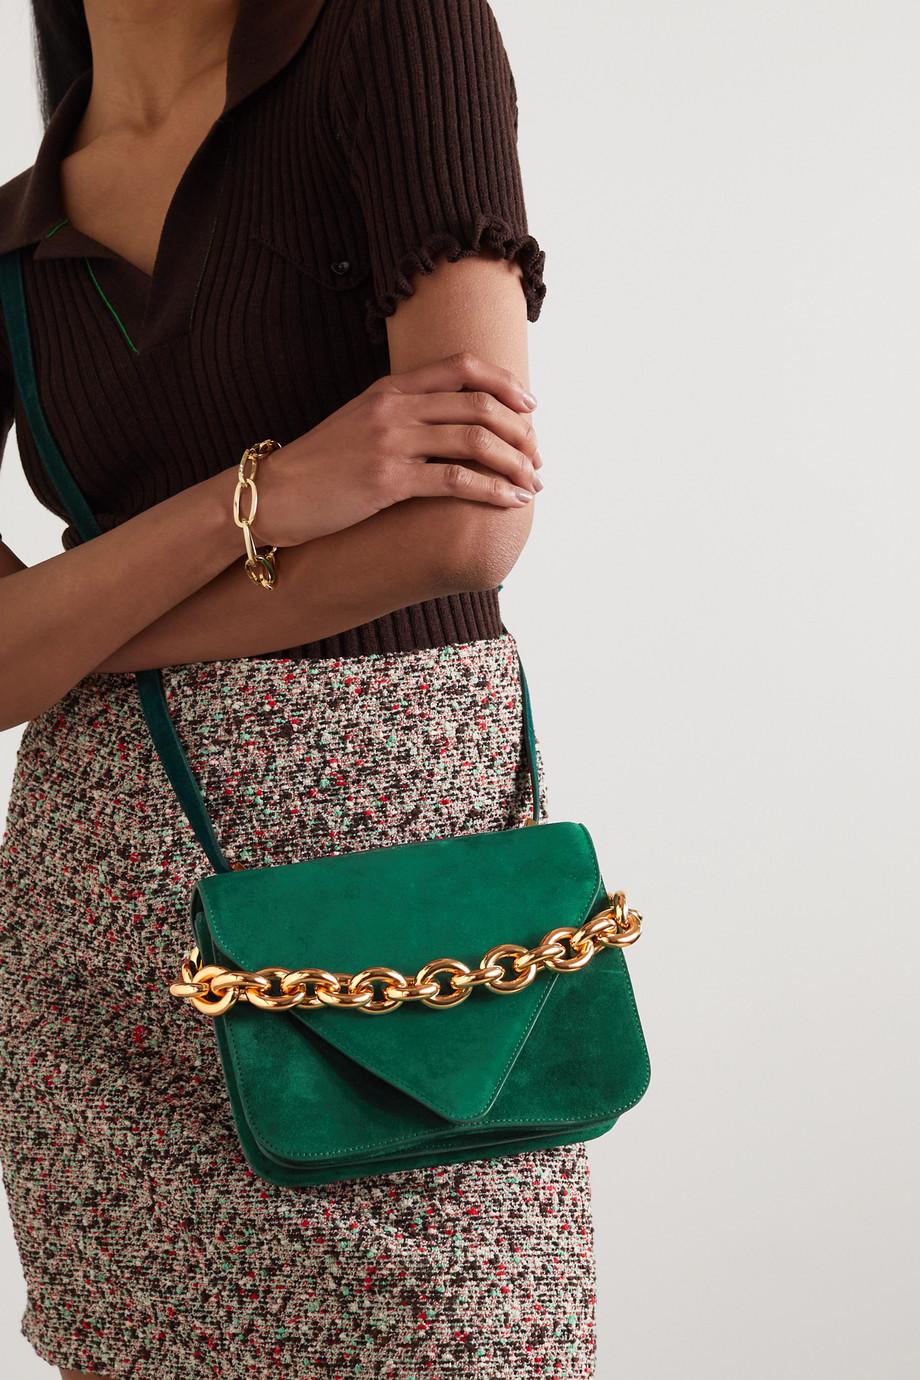 Bottega Veneta Chain small suede shoulder bag